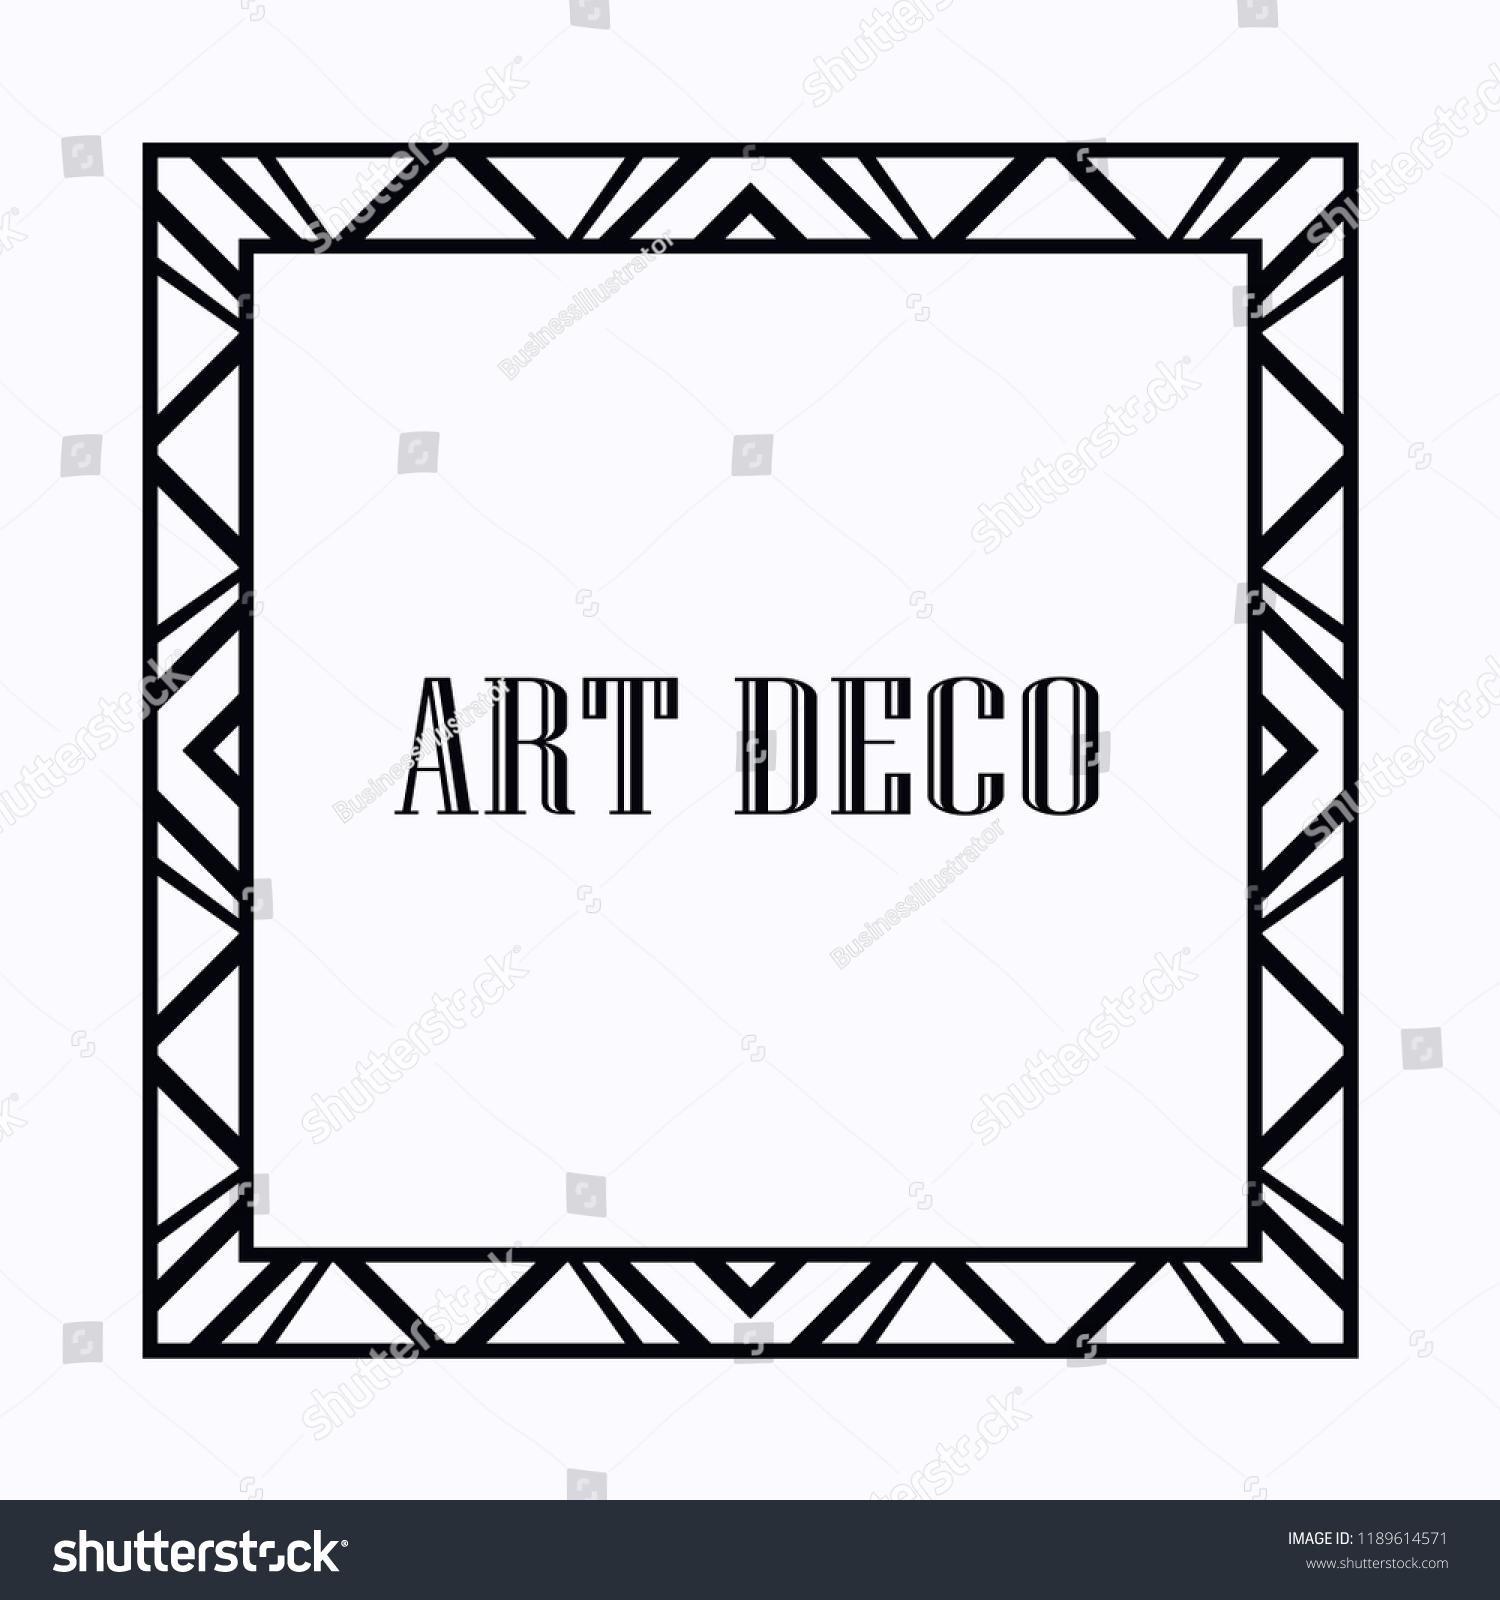 vintage retro style invitation art deco stock vector royalty free